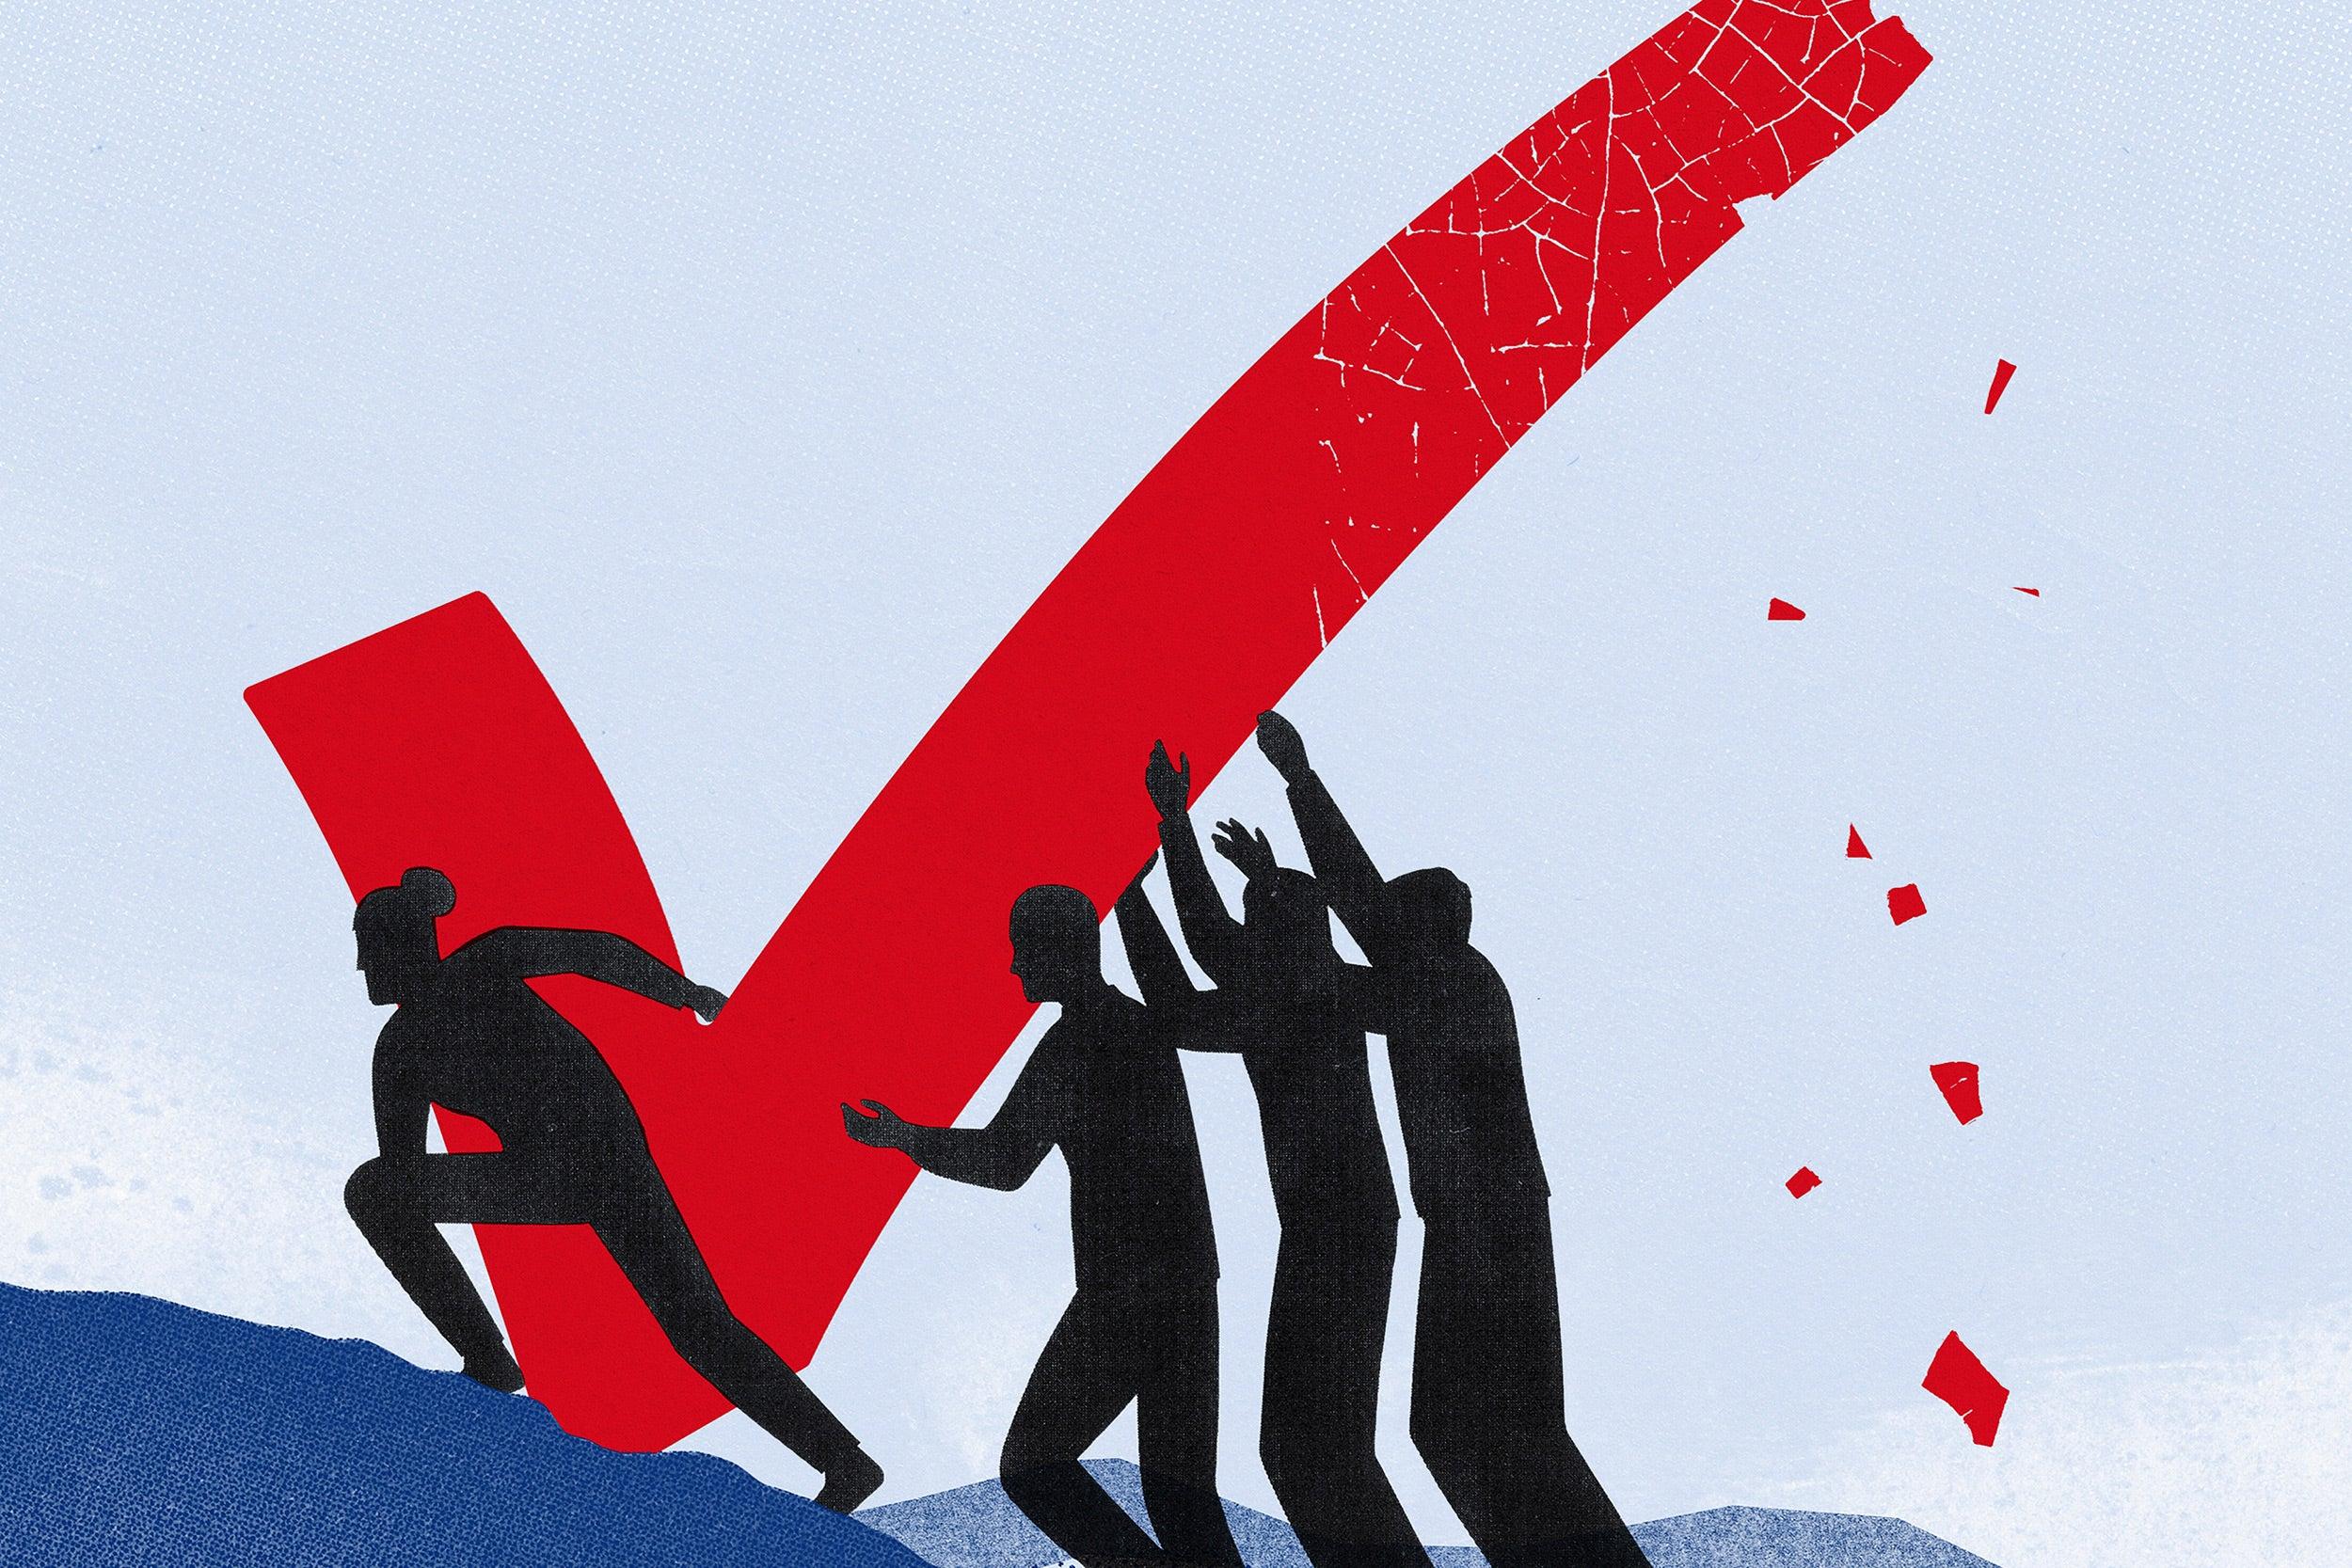 Illustration of people pushing checkmark uphill.